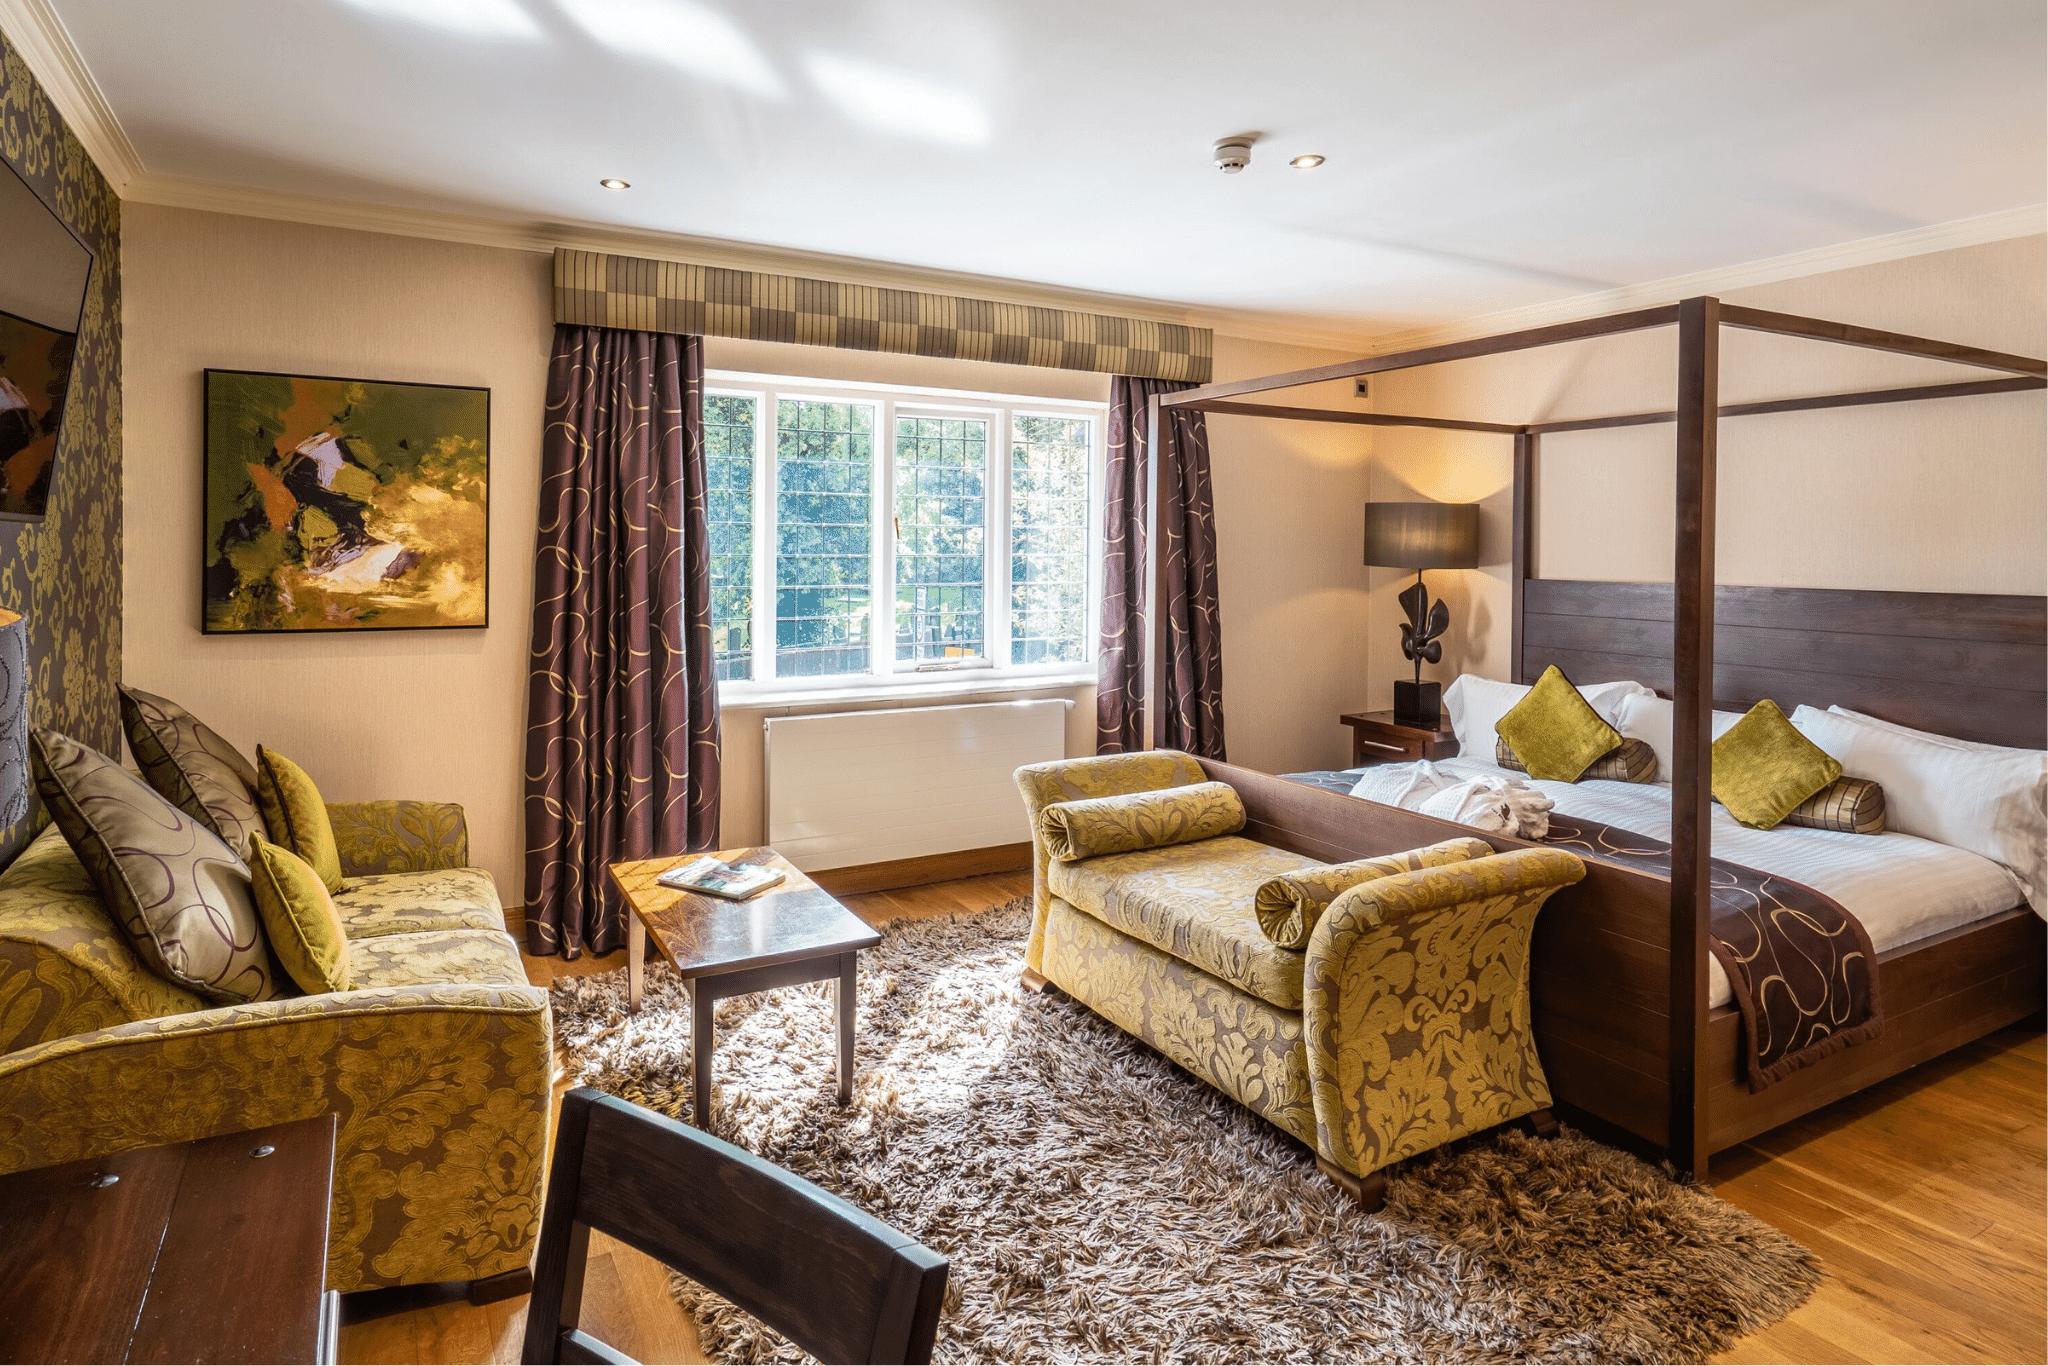 Luxury hotel in Cheshire